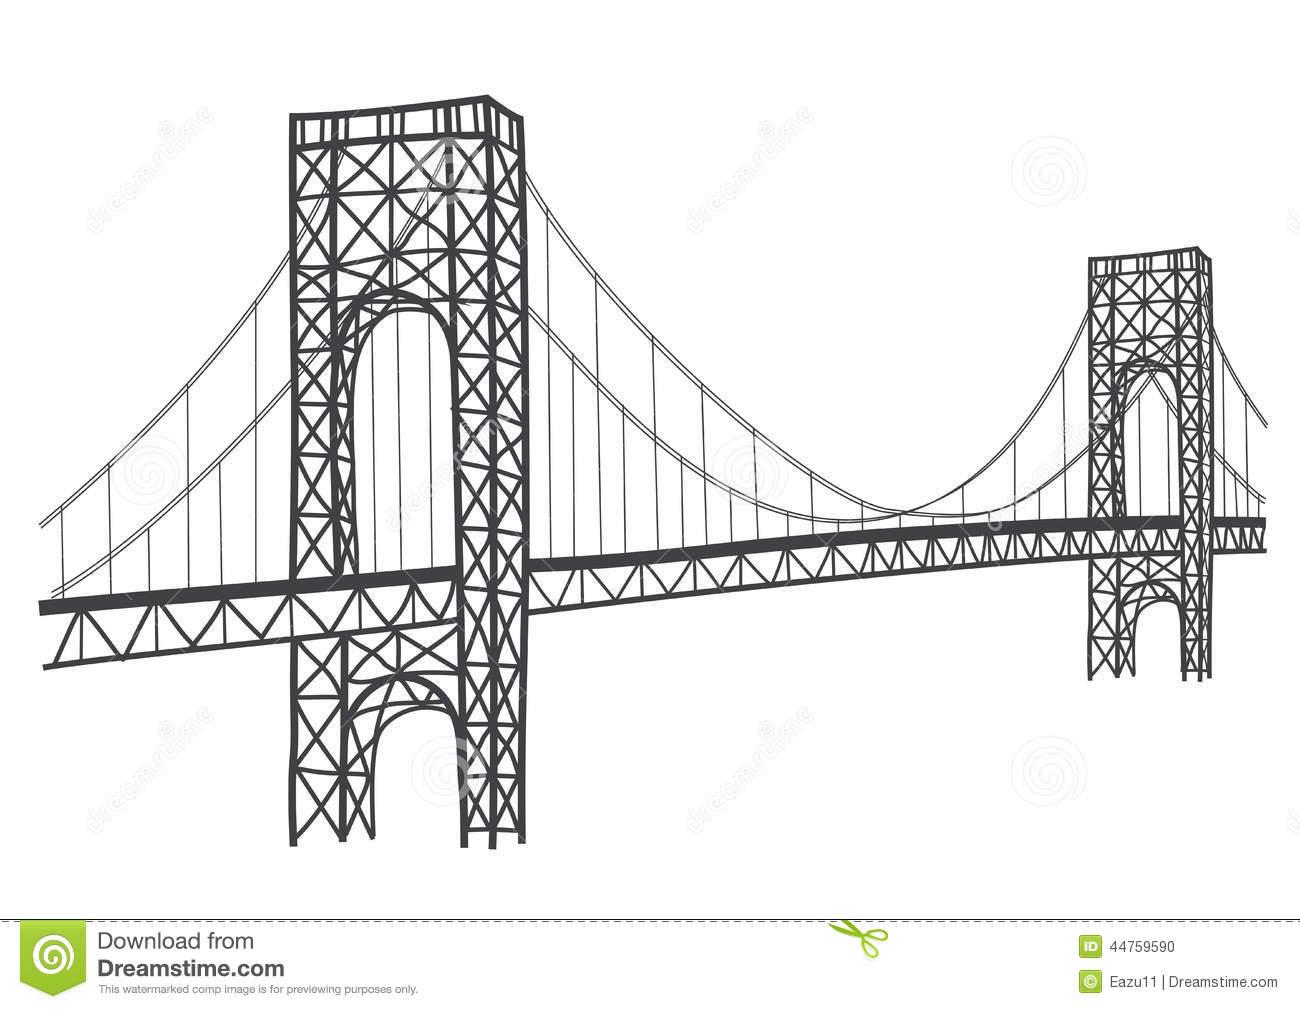 Bridge free clipart svg black and white Bridge Clipart & Look At Clip Art Images - ClipartLook svg black and white